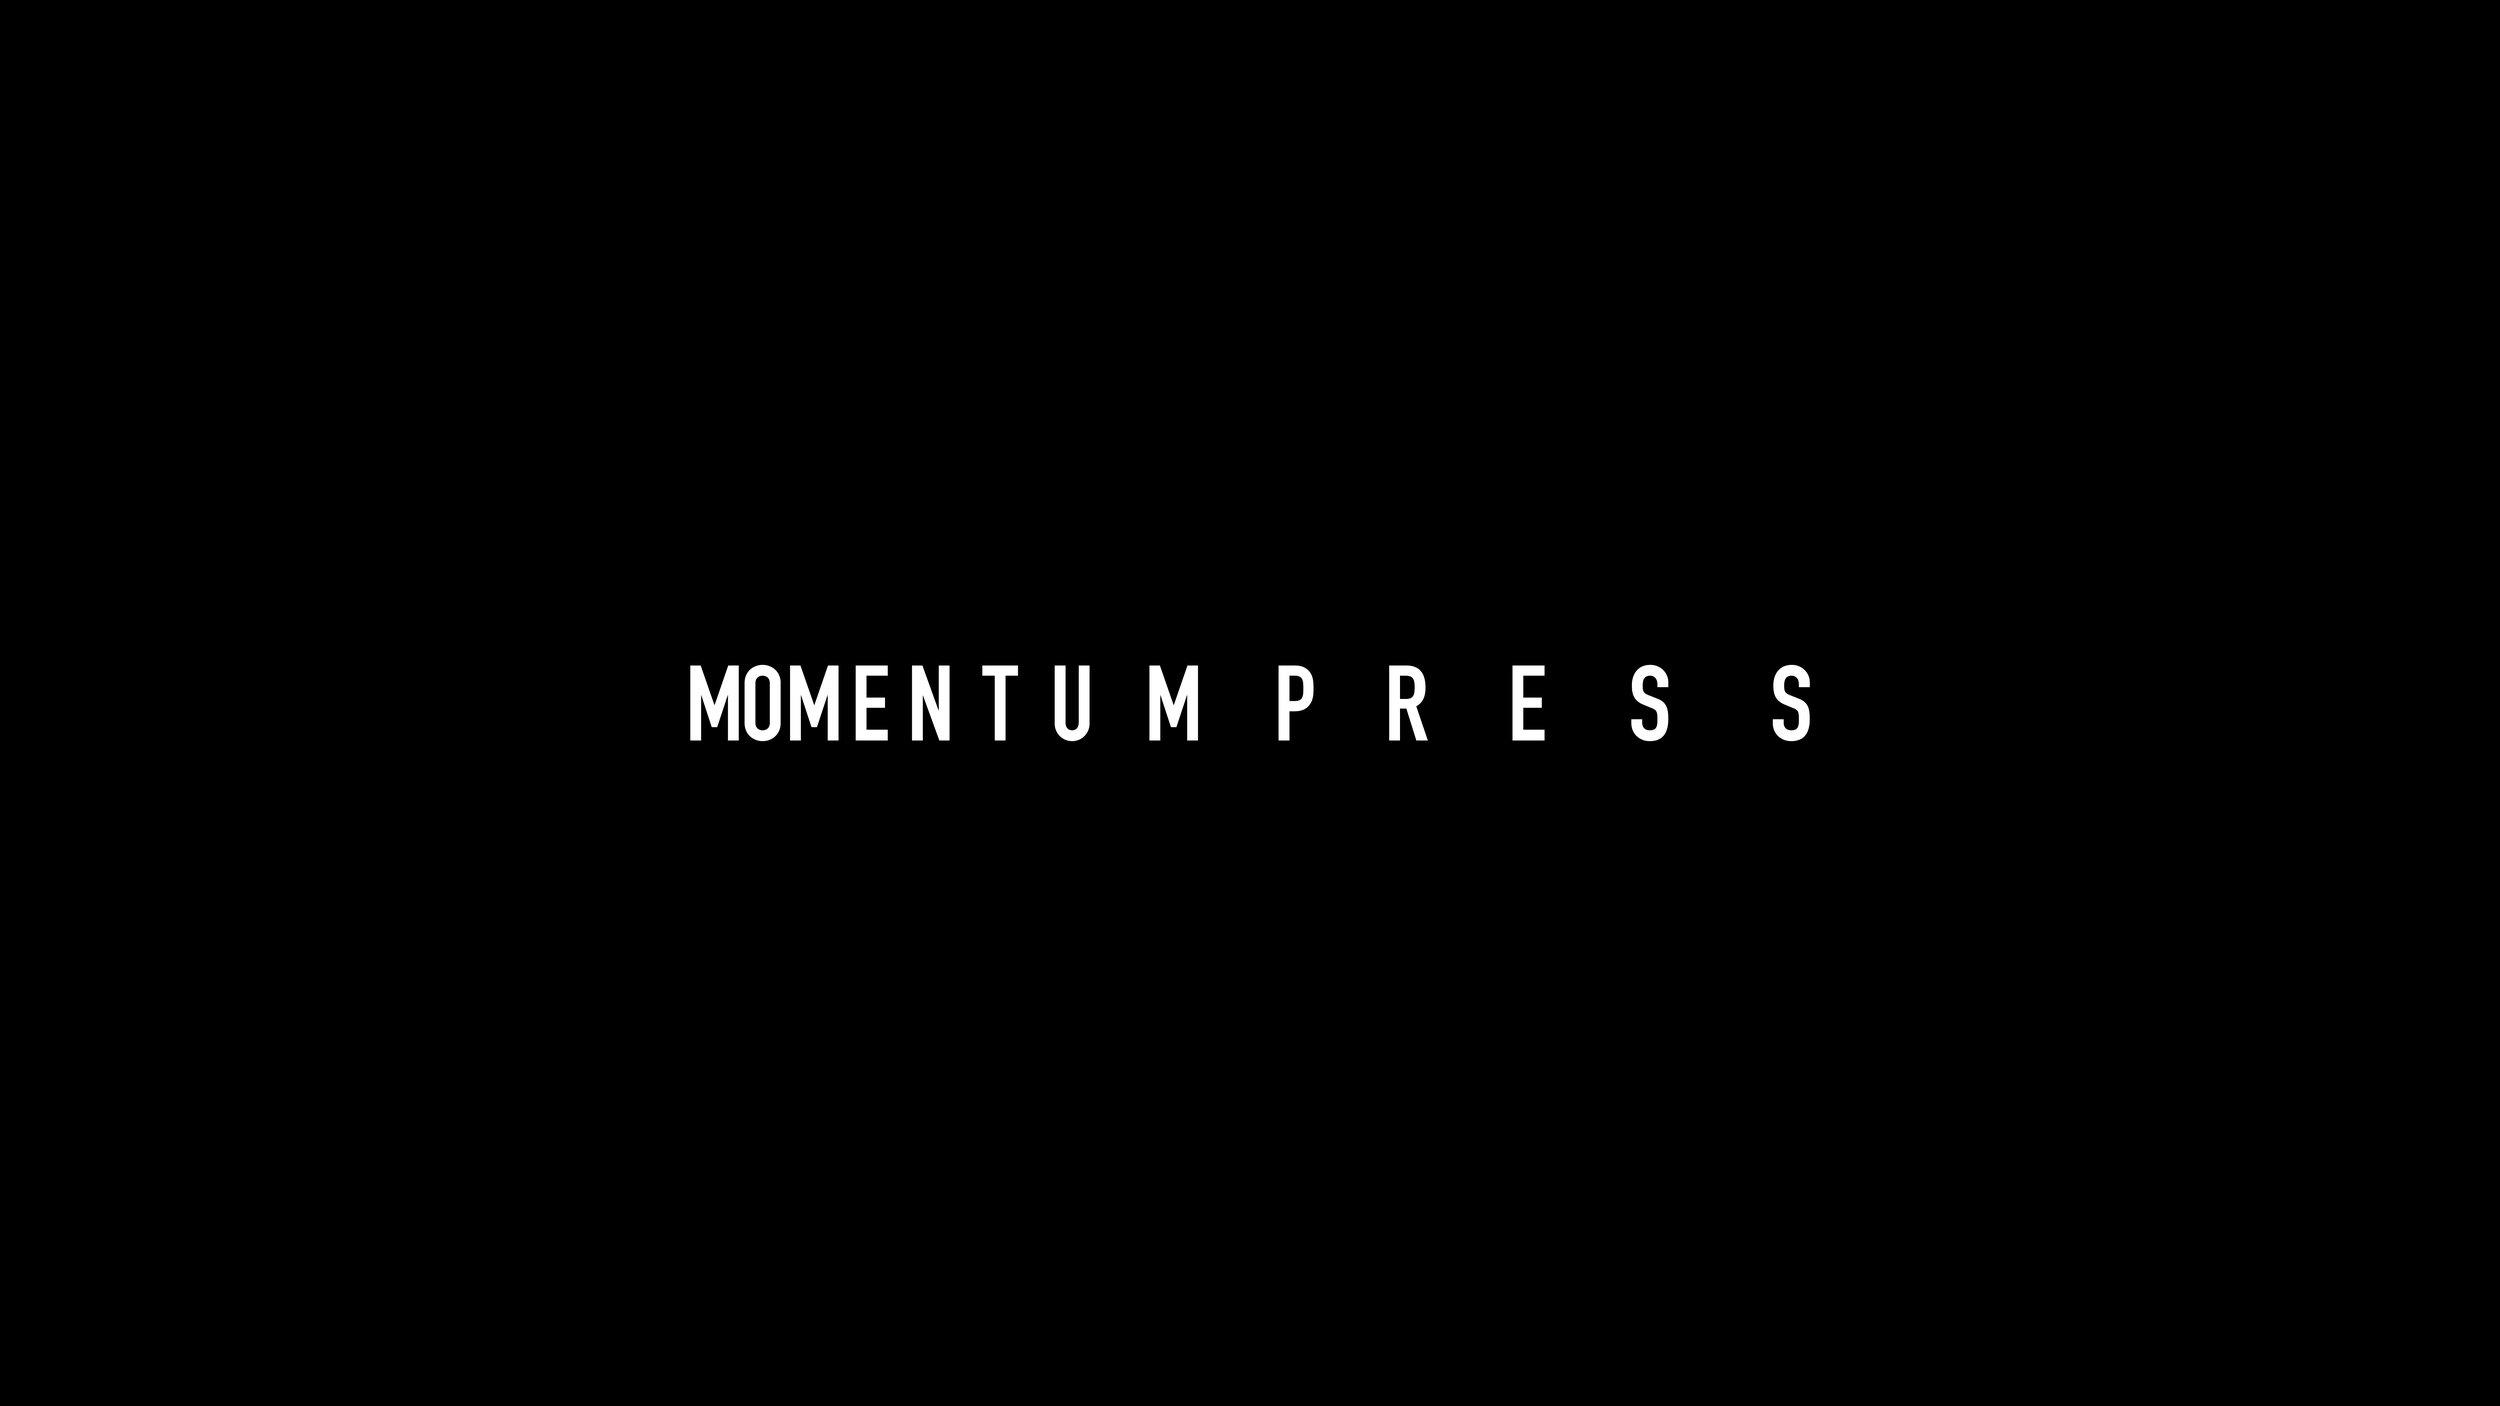 Momentum_2.jpg